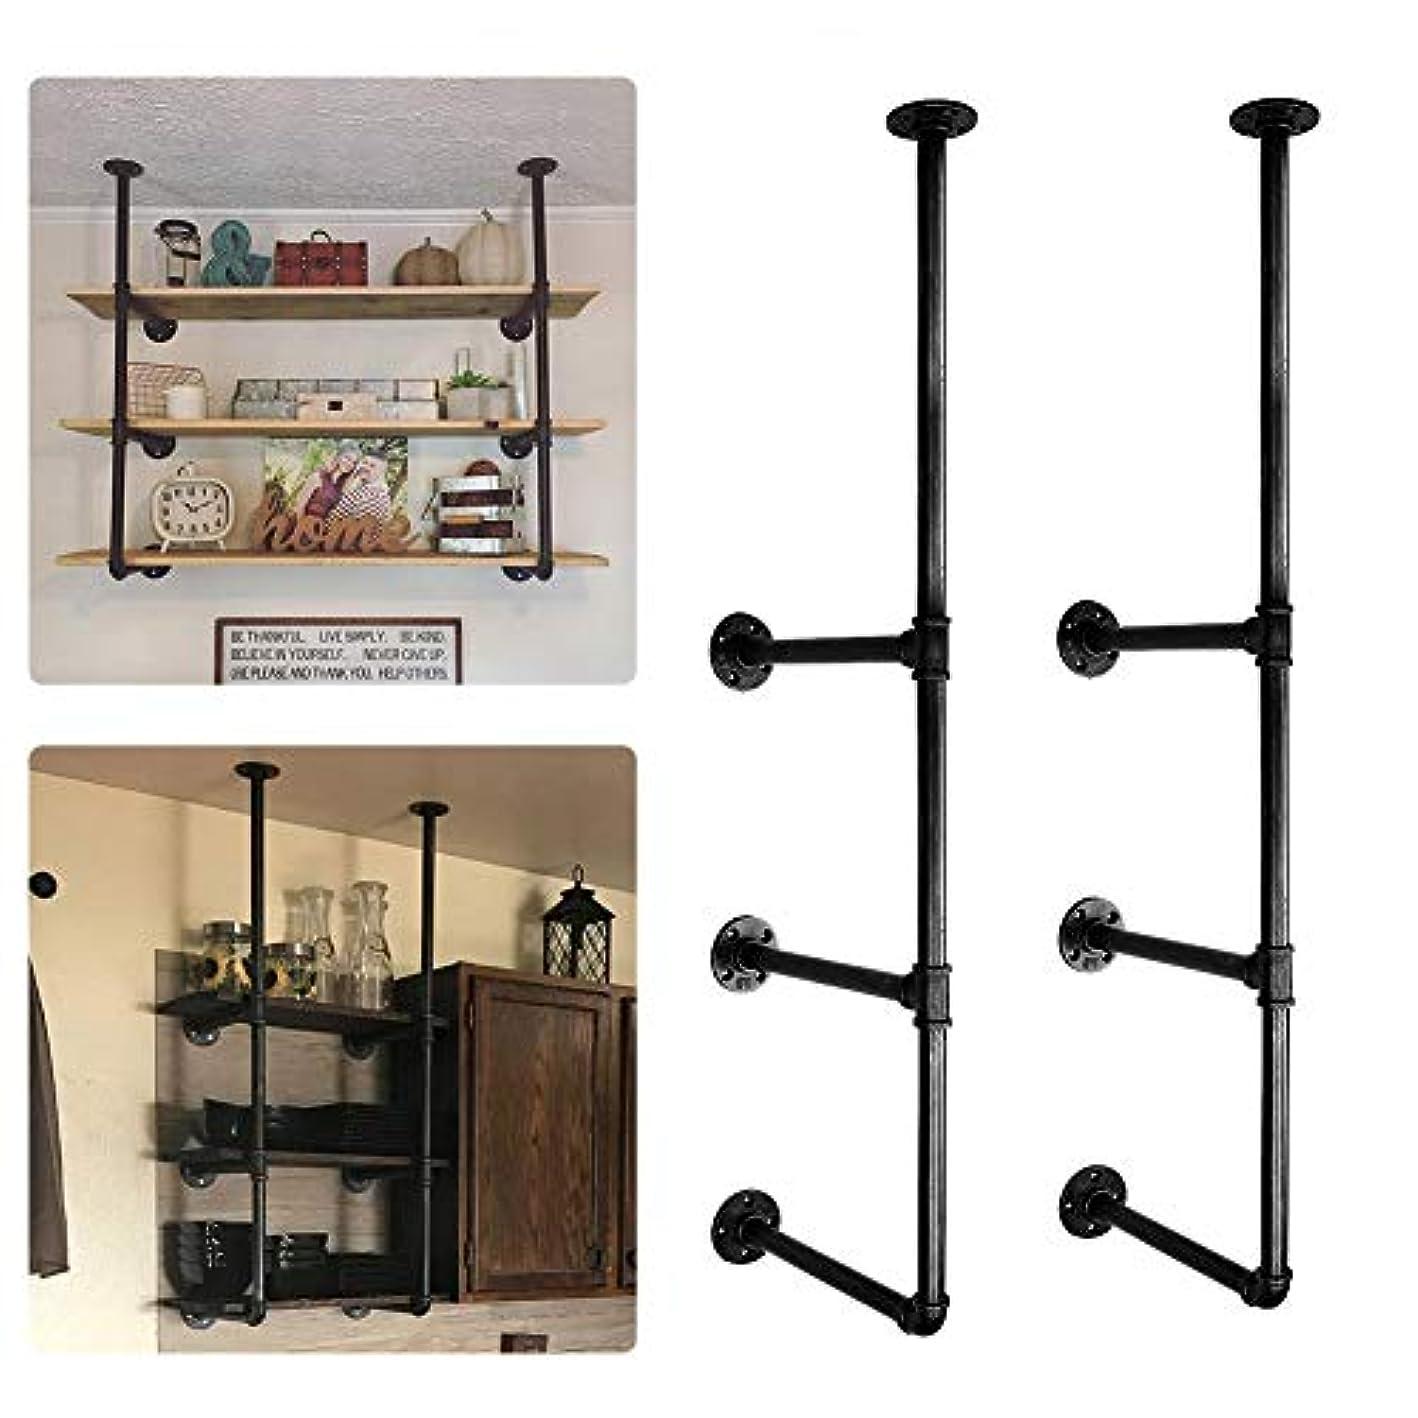 GoYonder Industrial Wall Mounted Iron Pipe Shelf, Retro Bookcases Rustic Hung Bracket DIY Storage Shelving Bookshelf Utility Shelves (Black, 2 pcs)